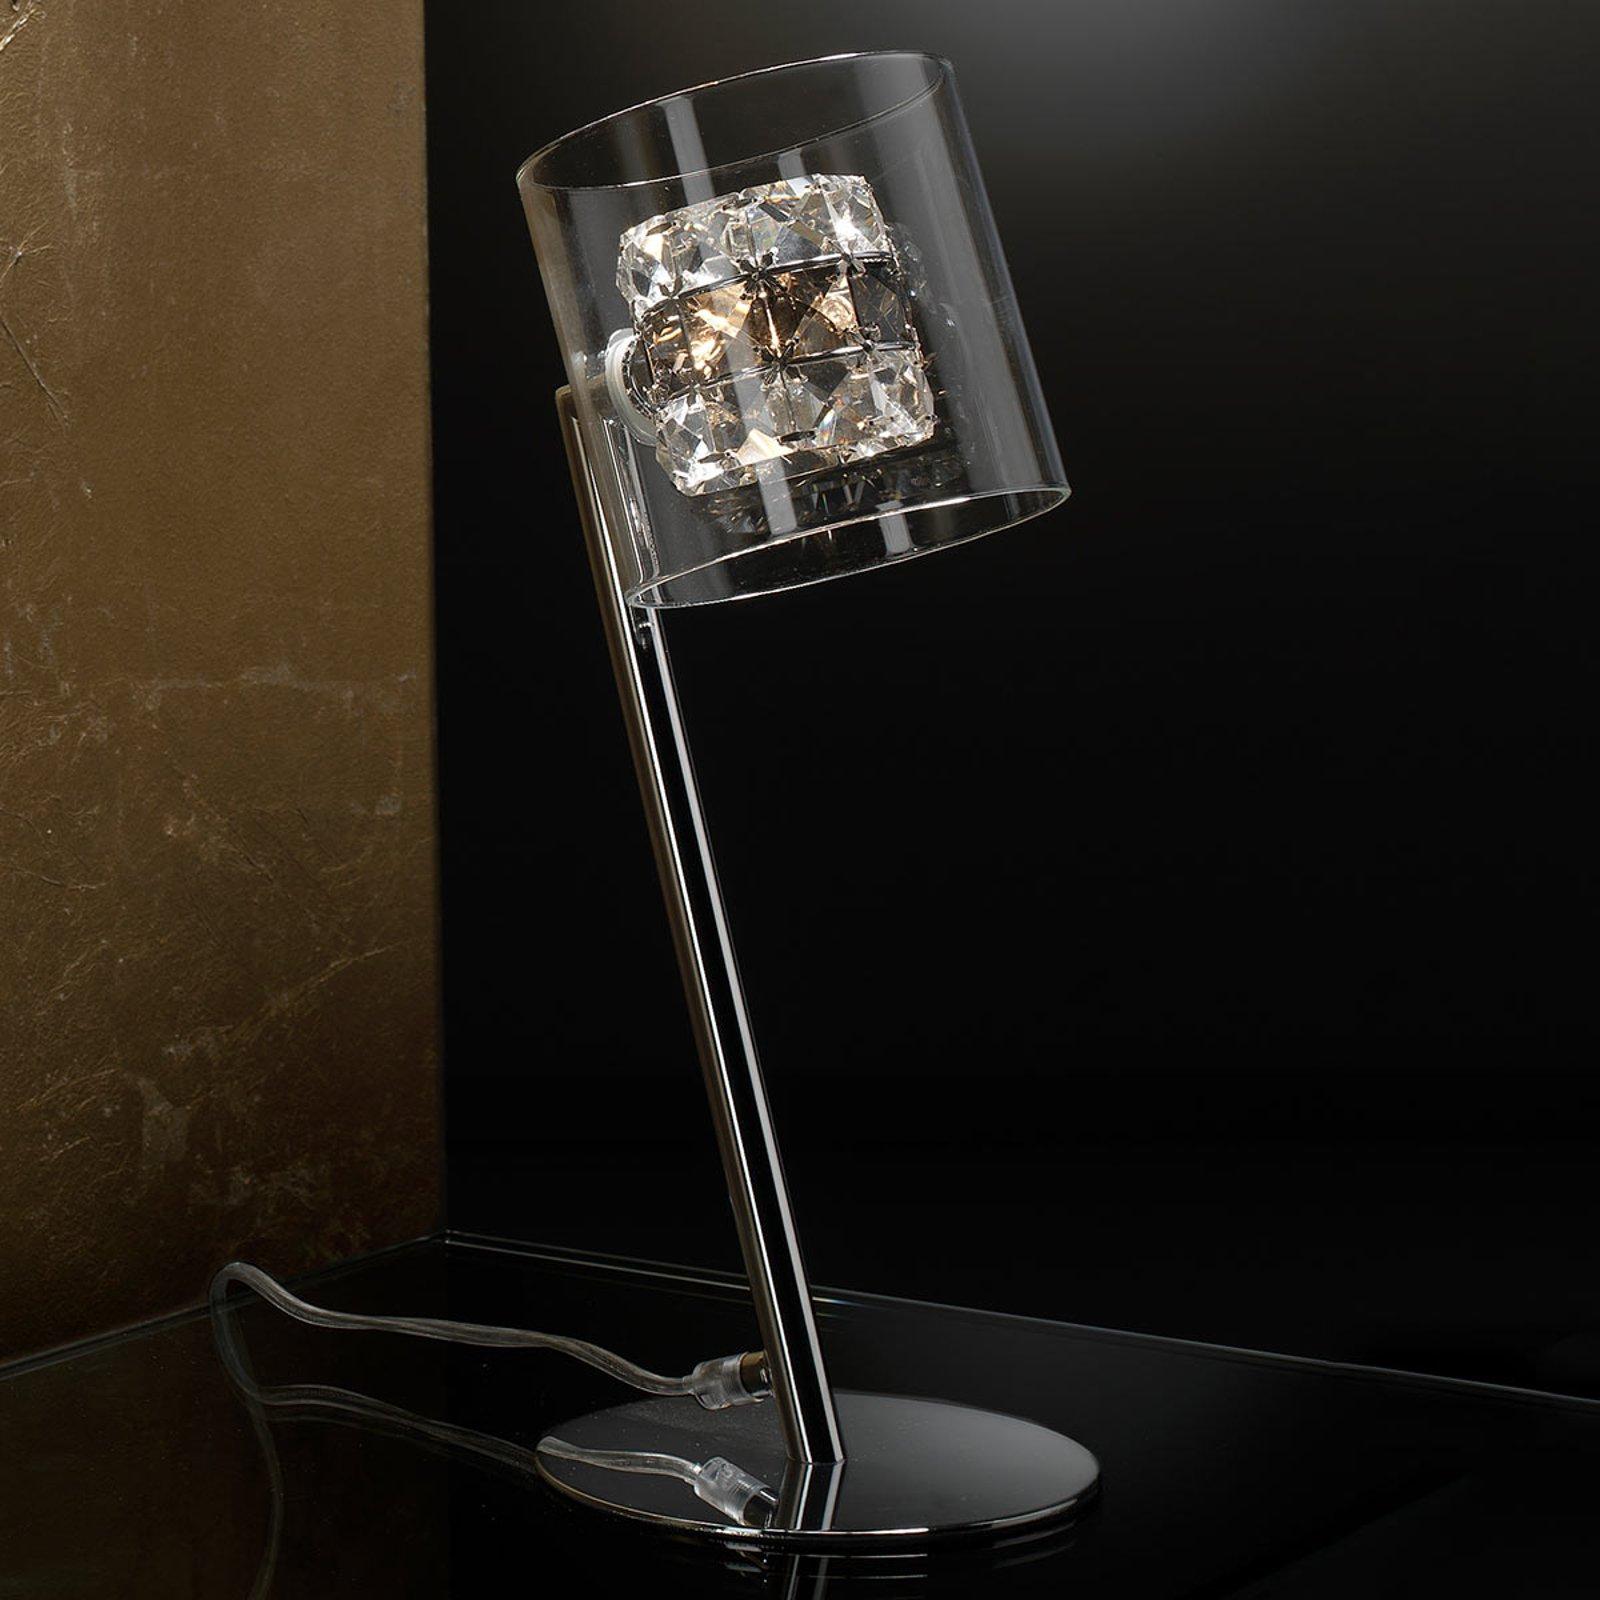 LED-bordlampe Flash med krystallringer